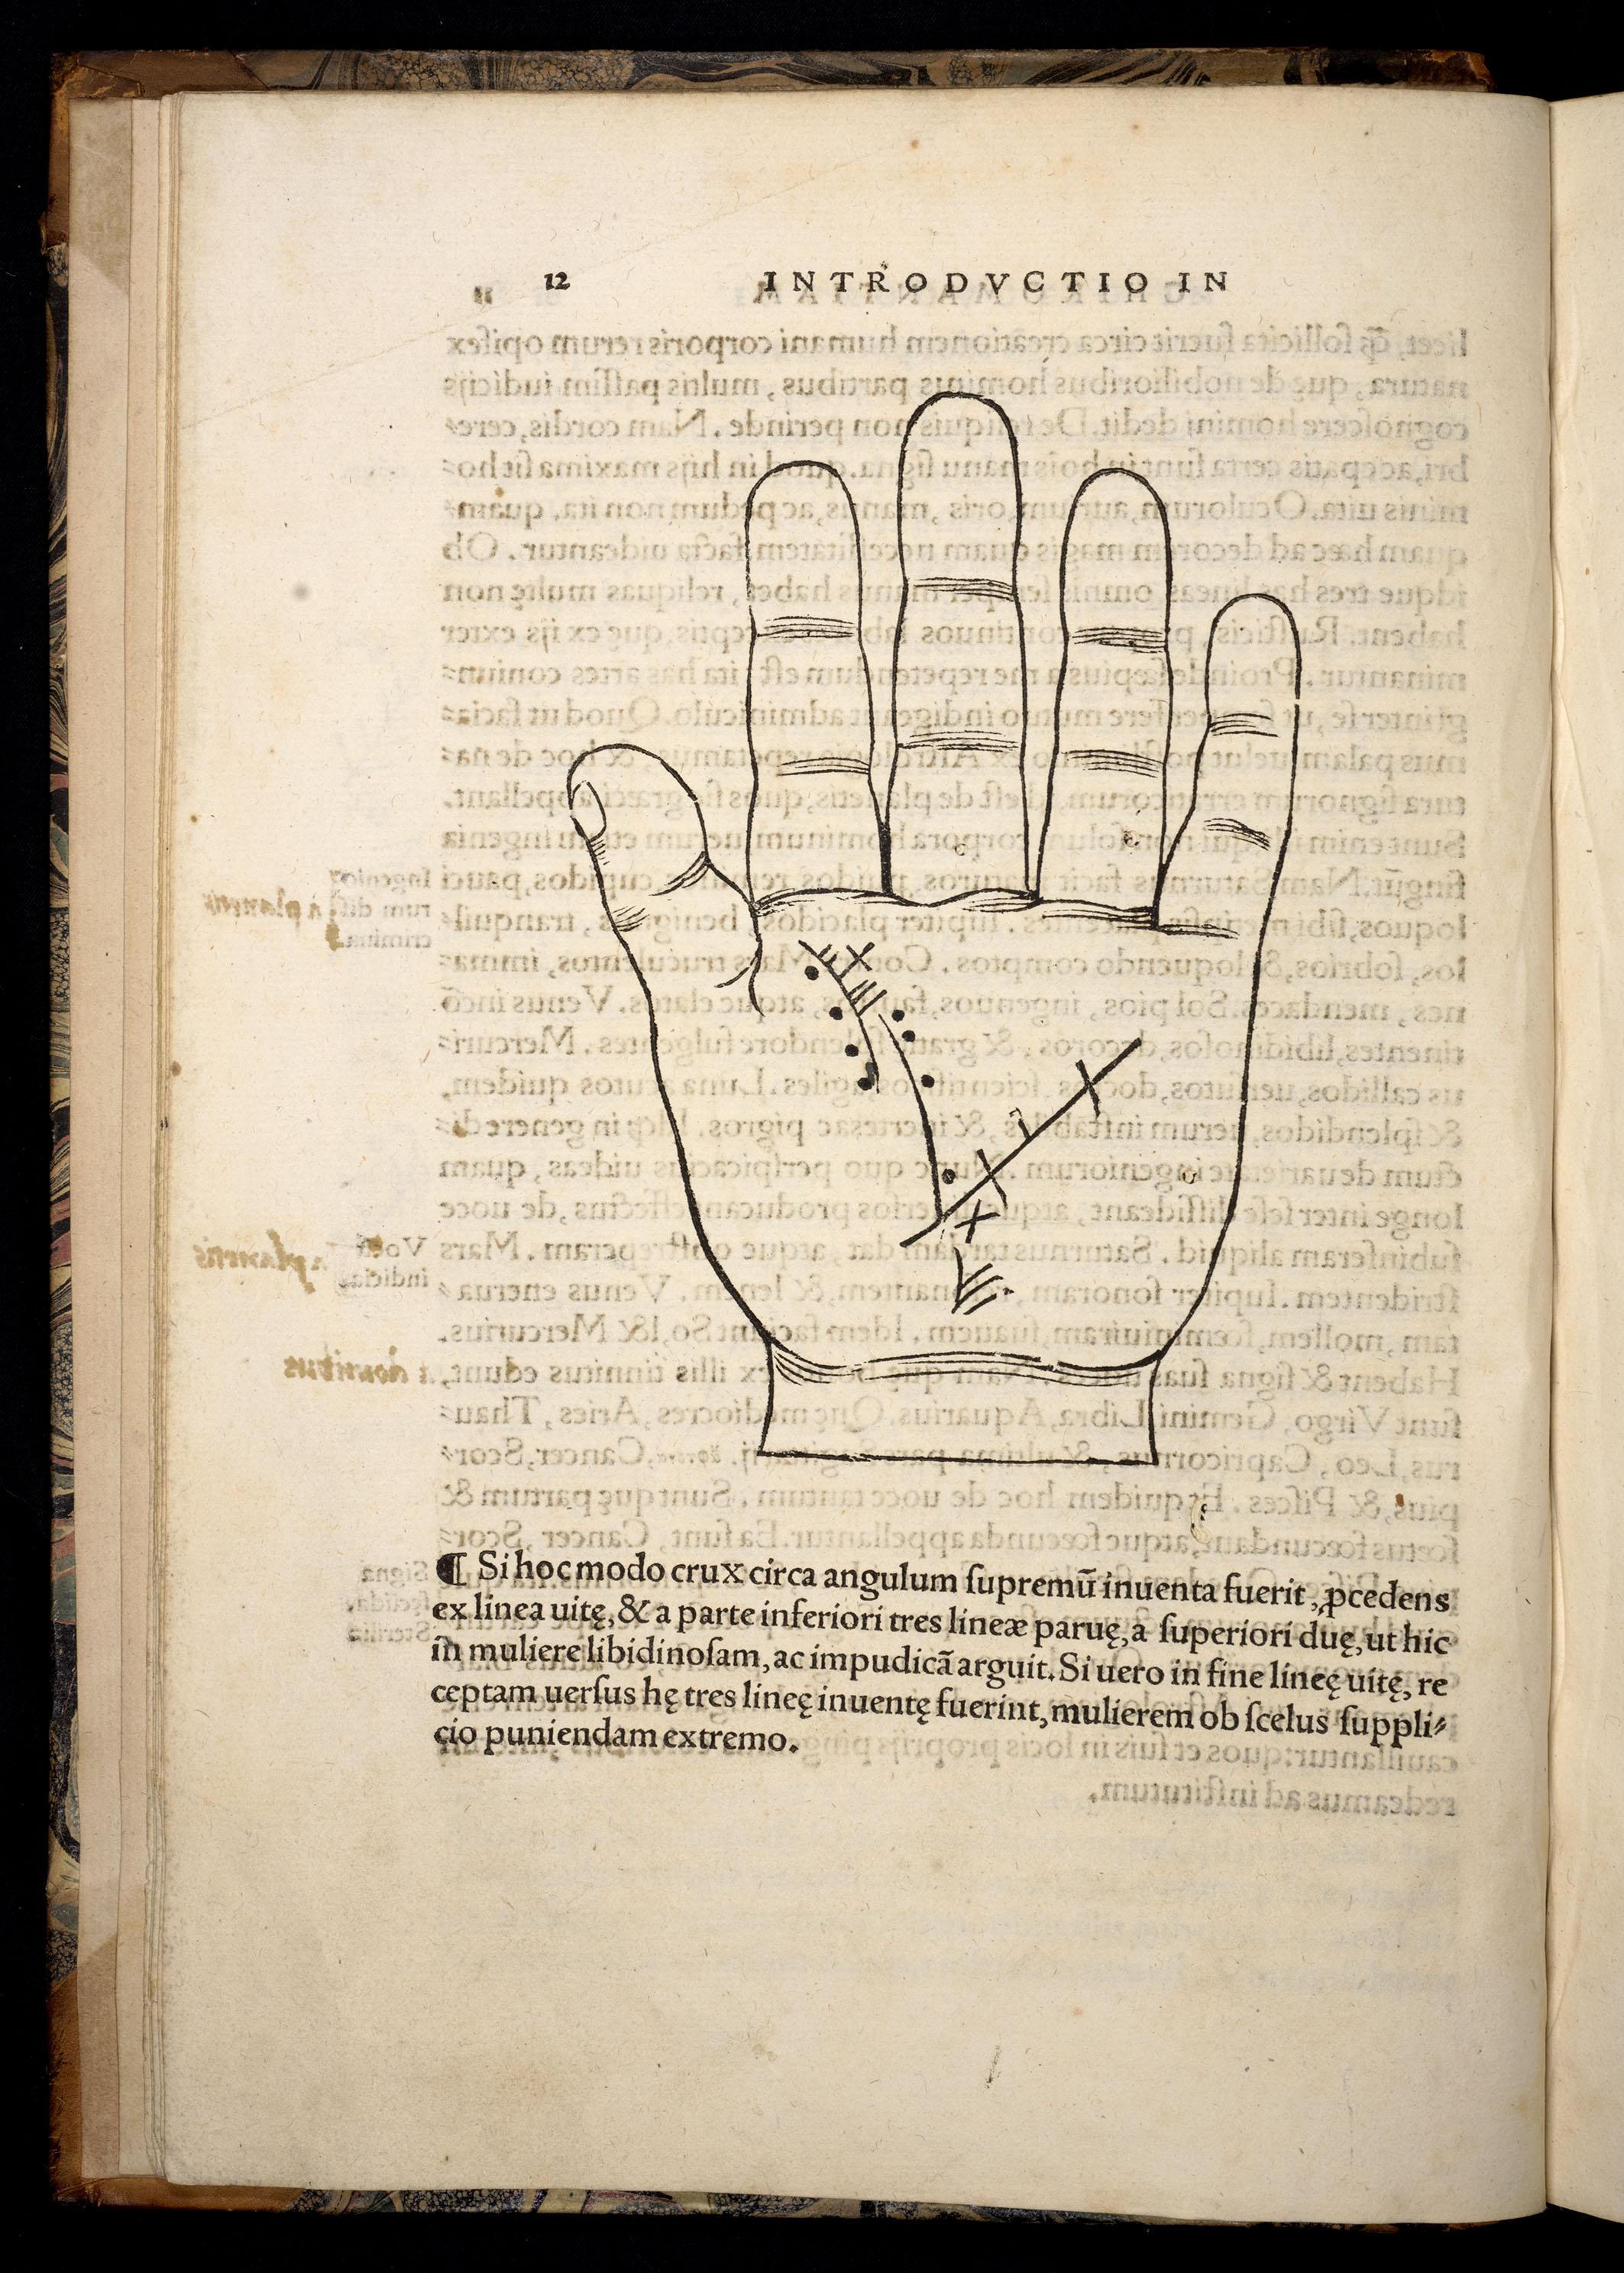 BT3.250.13, p.12, Johannes Indagine's Chiromantia, 1531